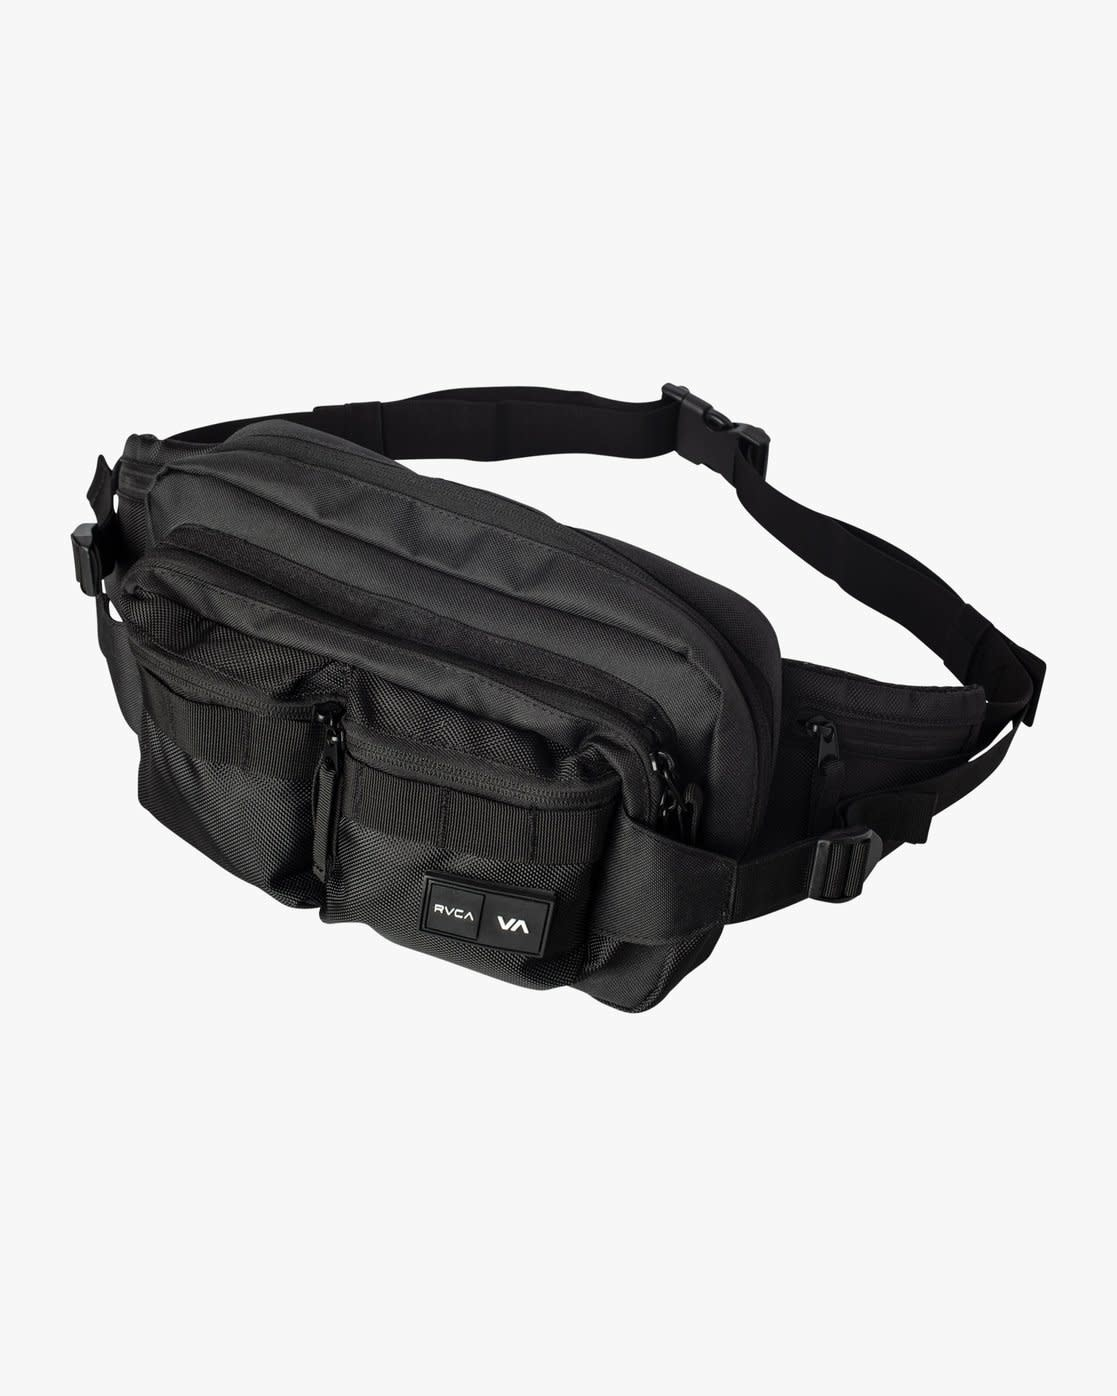 RVCA RVCA Waist Pack Deluxe Black